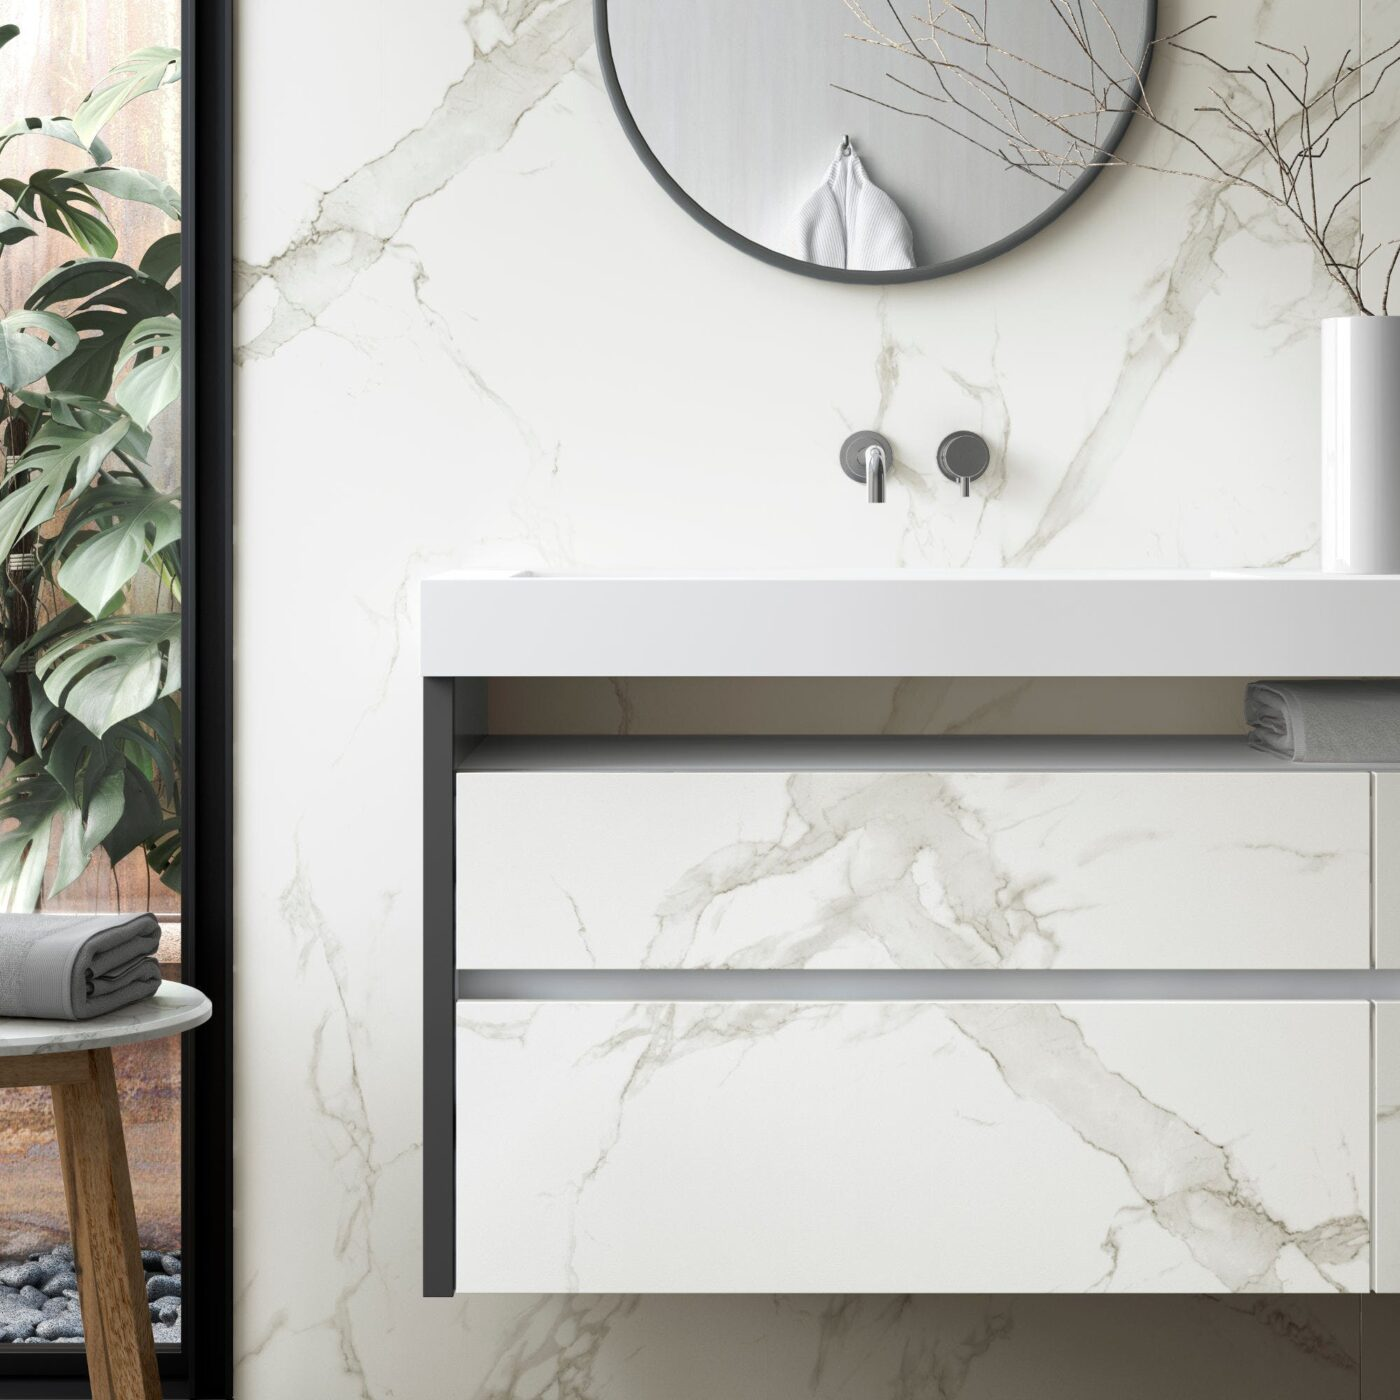 Image of Dekton Bathroom Aura 15 Detalle in Cinco ideias de design interessantes para casas de banho em tons de cinzento e branco - Cosentino